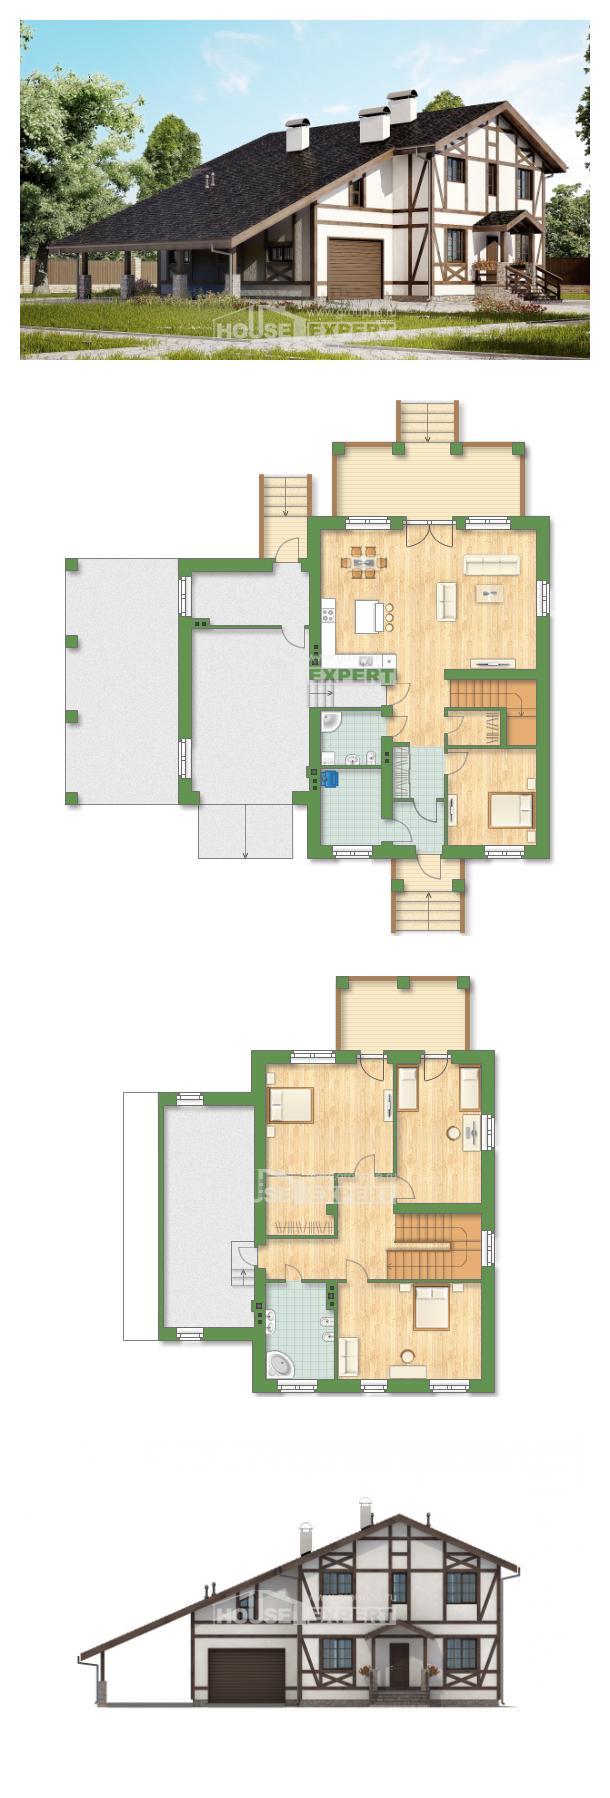 Proyecto de casa 250-002-L   House Expert